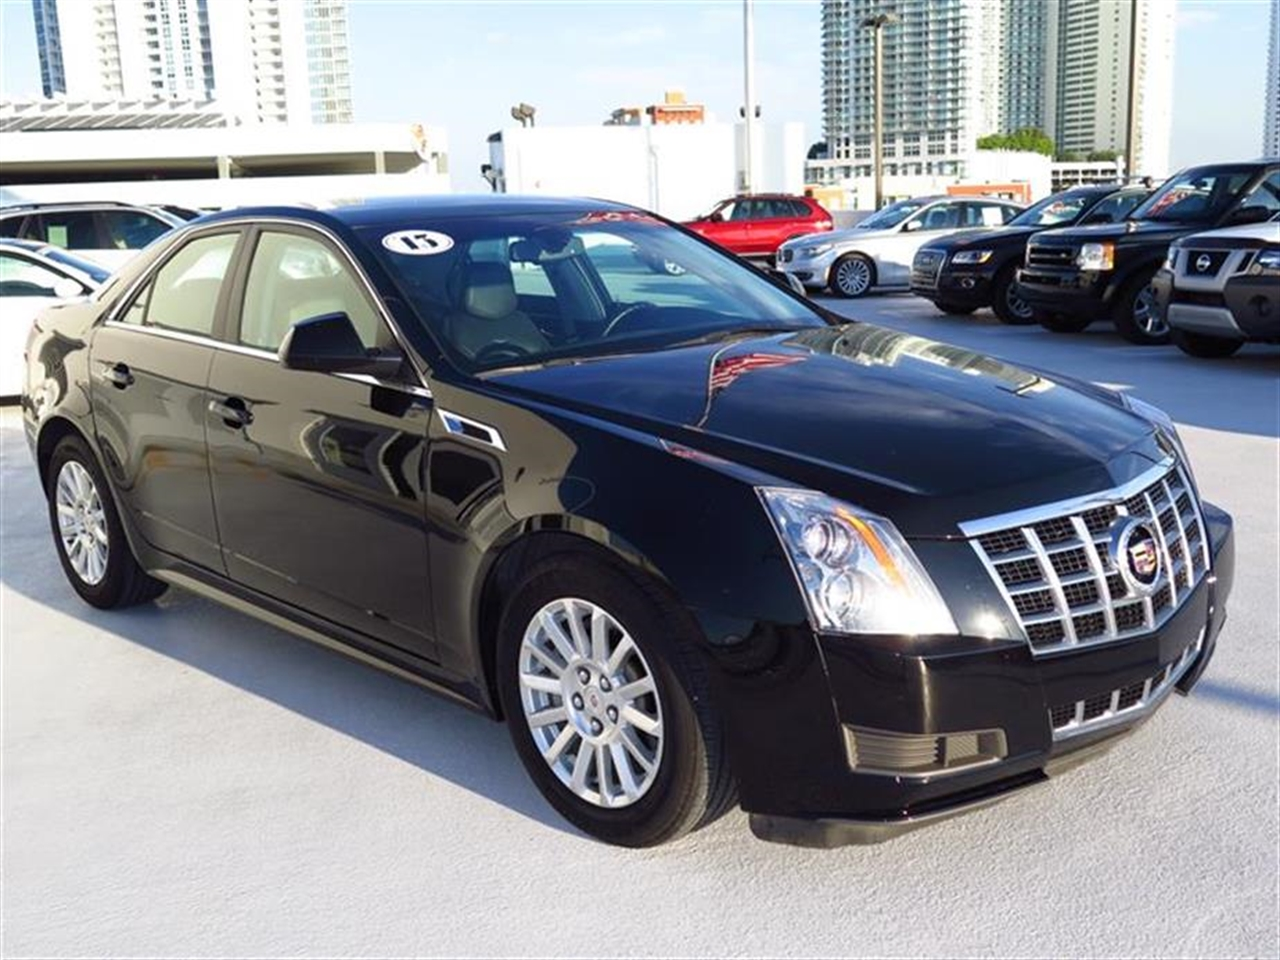 2013 CADILLAC CTS 4dr Sdn 30L Luxury RWD 9996 miles VIN 1G6DE5E54D0101393